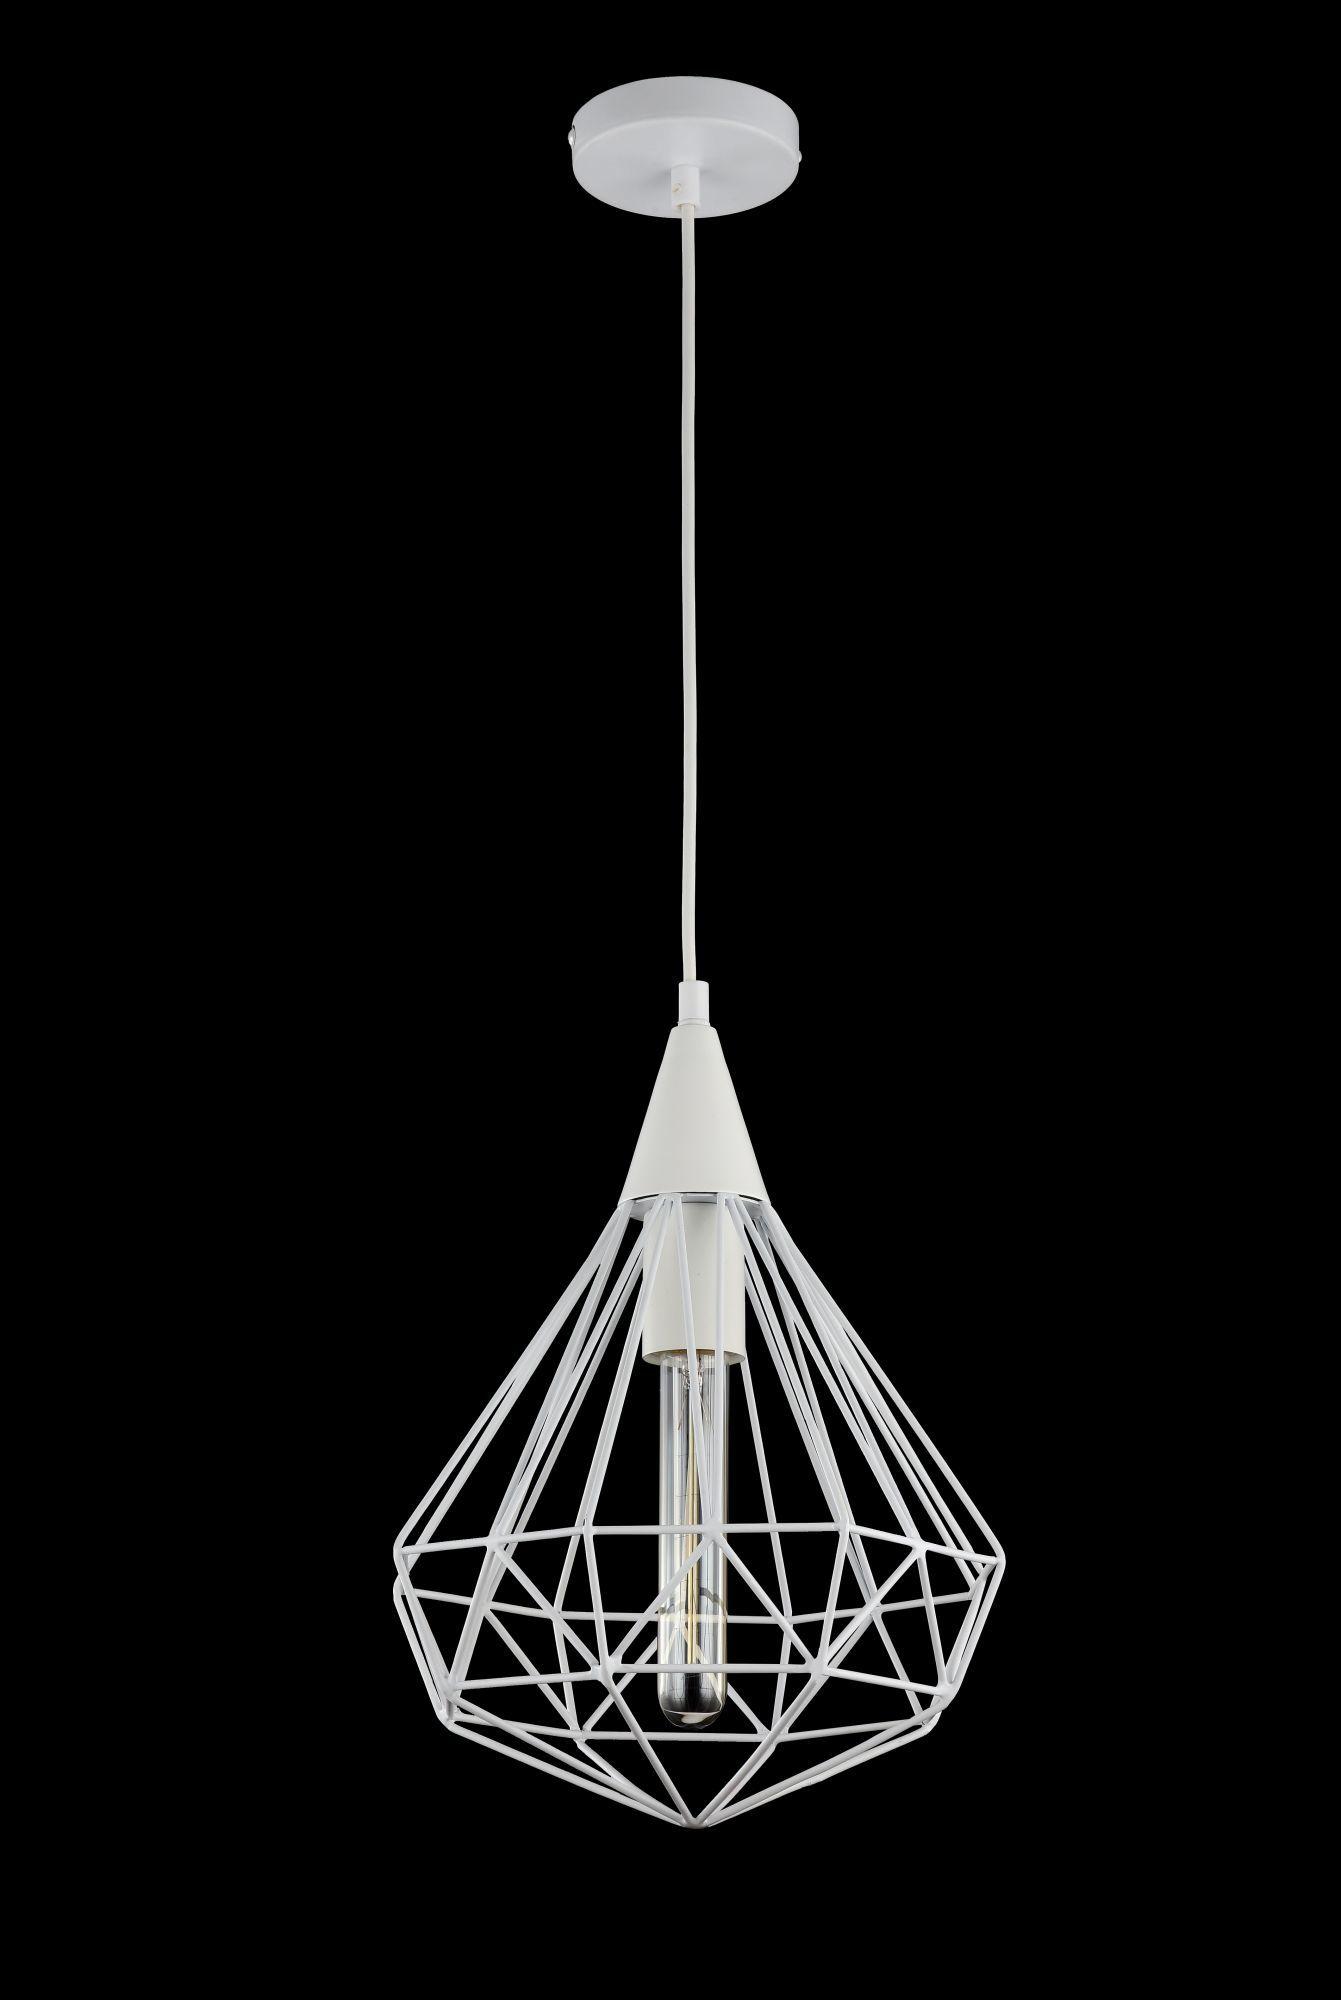 Подвесной светильник Maytoni Loft Calaf P360-PL-250-W (MOD360-01-W), 1xE27x60W, белый, металл - фото 2